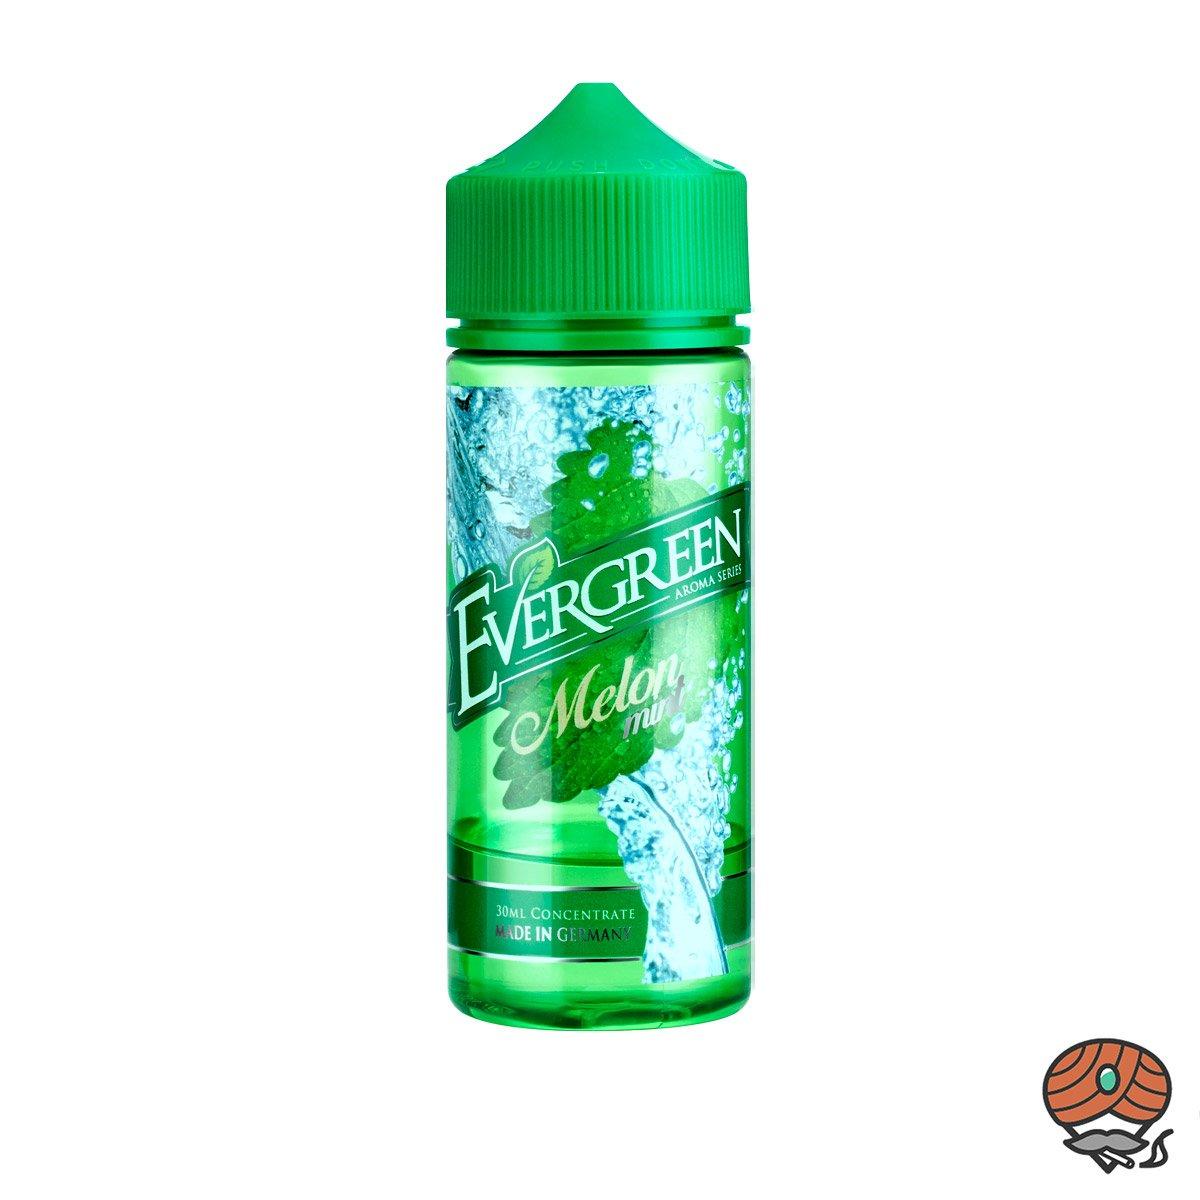 Melon Mint Evergreen Aroma 30 ml